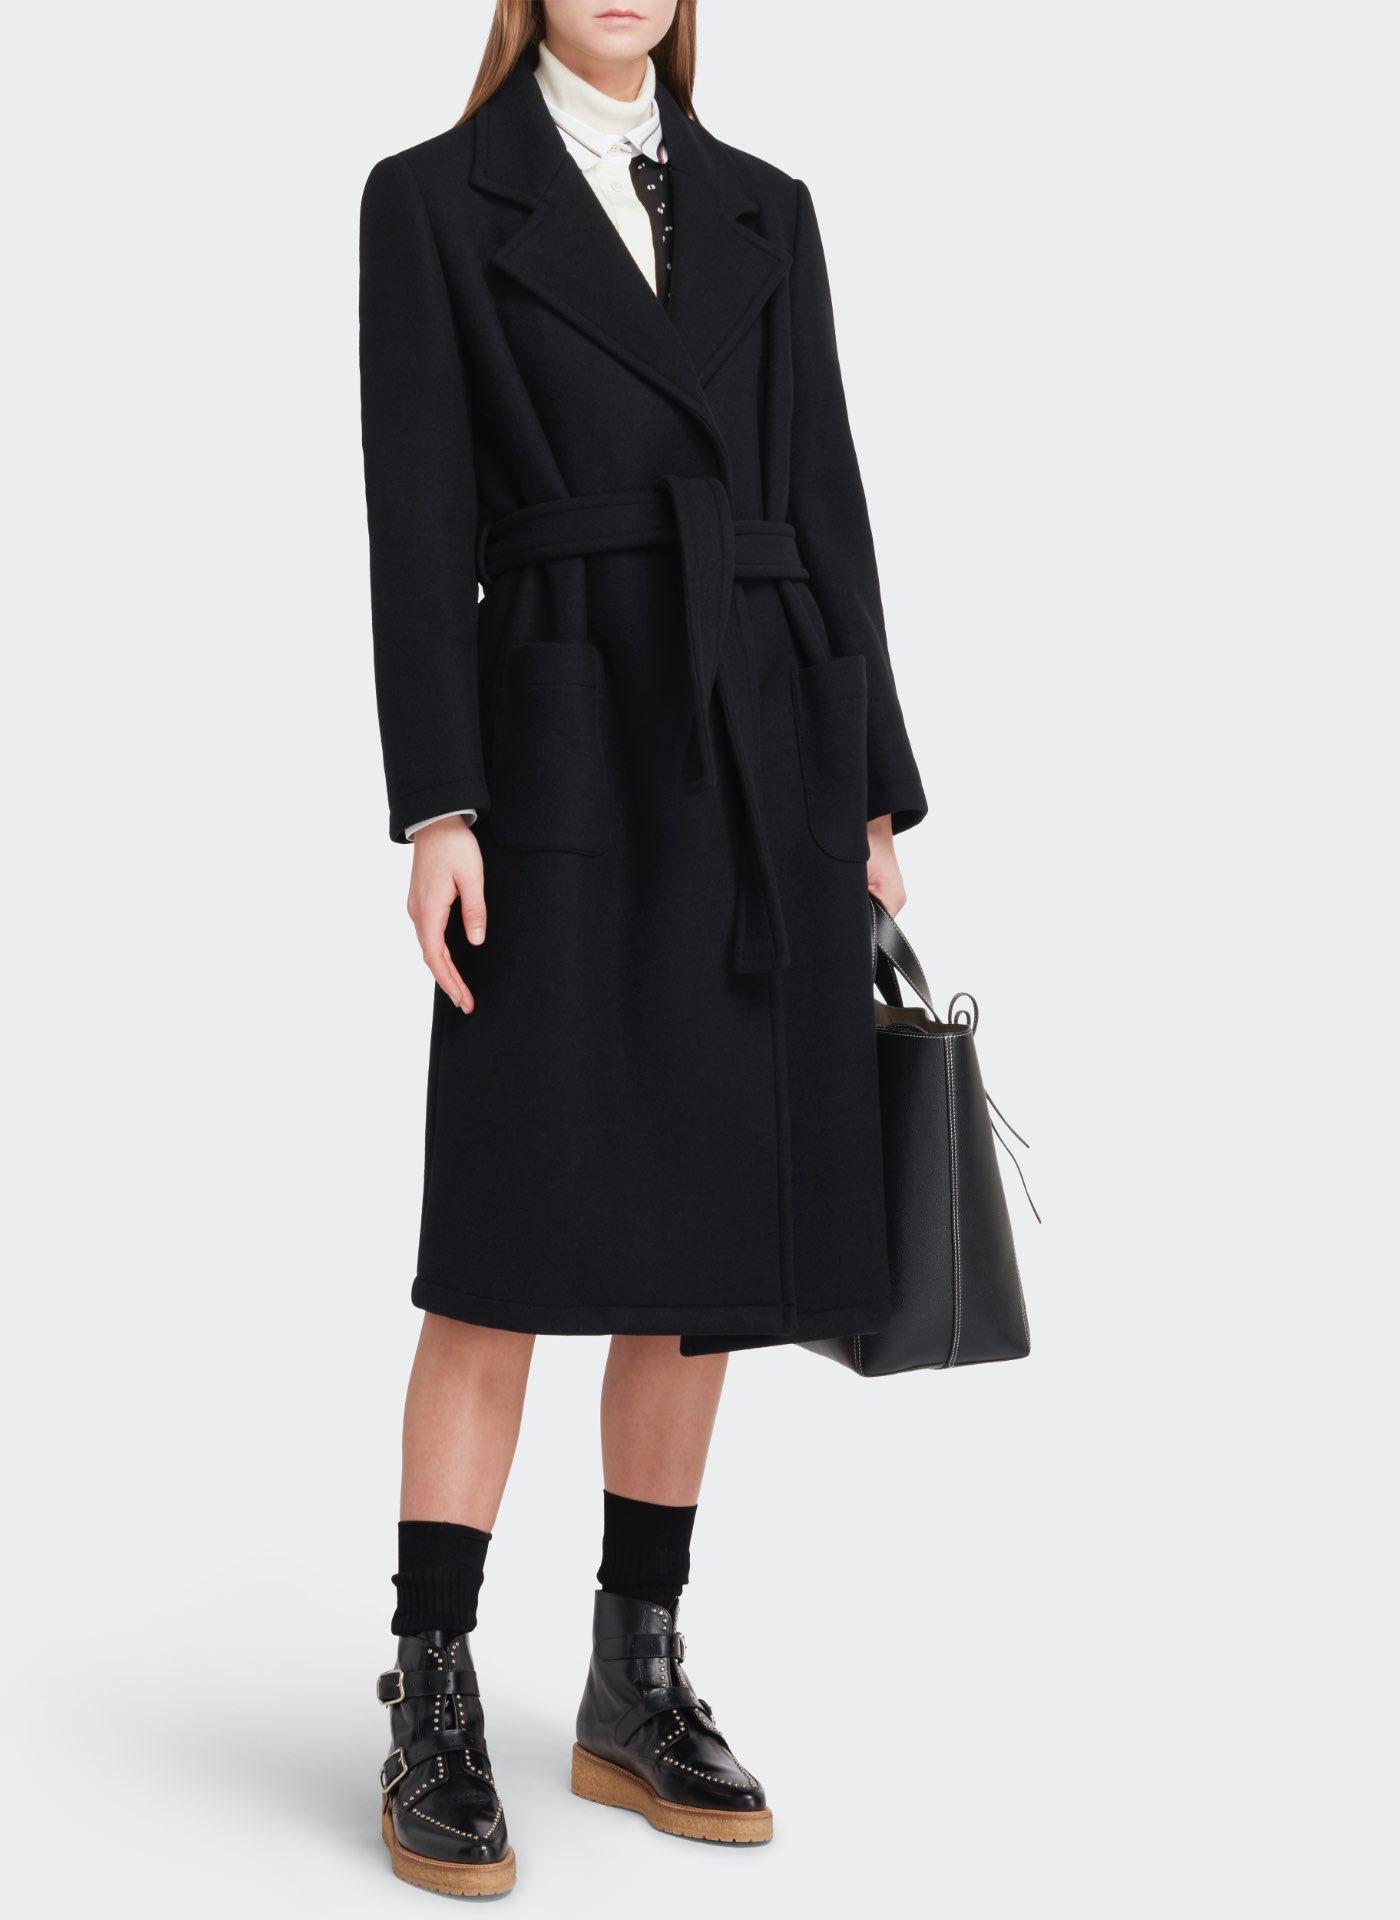 Womenswear model wearing black J&M Dress with a black leather bag